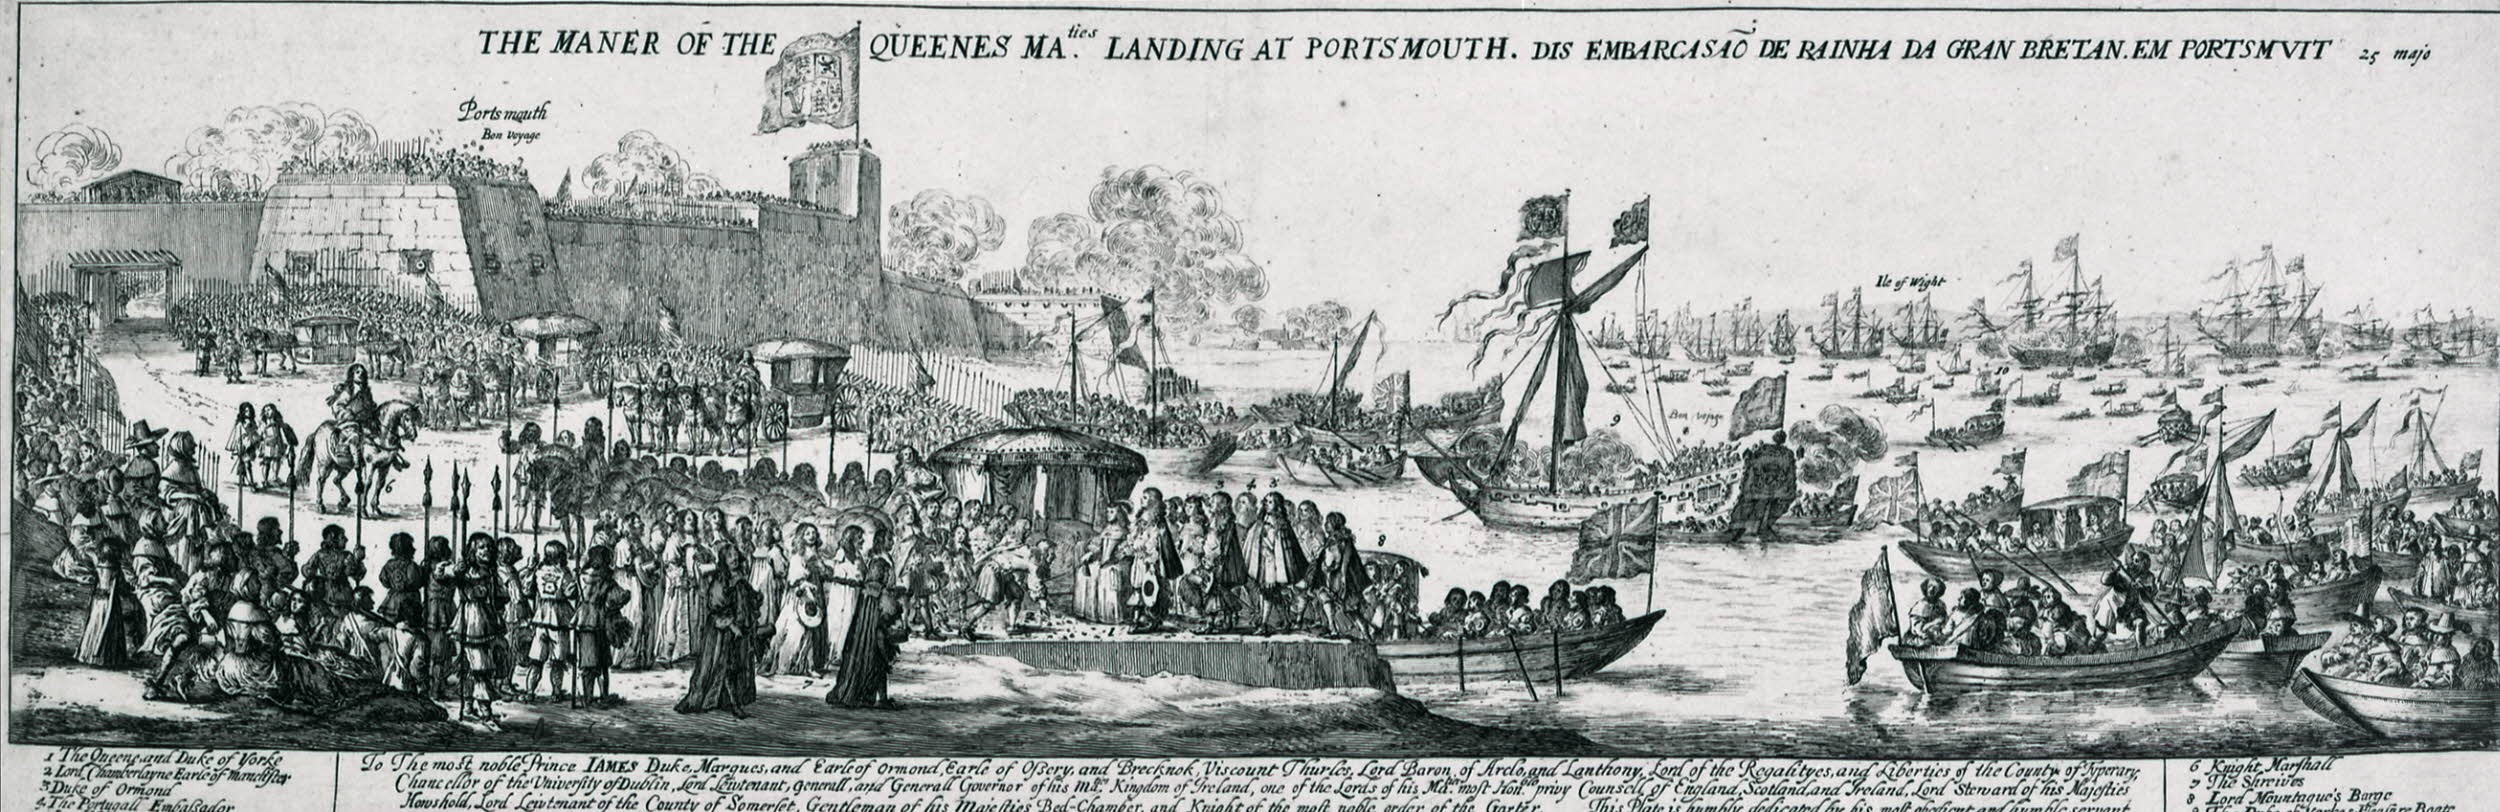 Portsmouth 1662